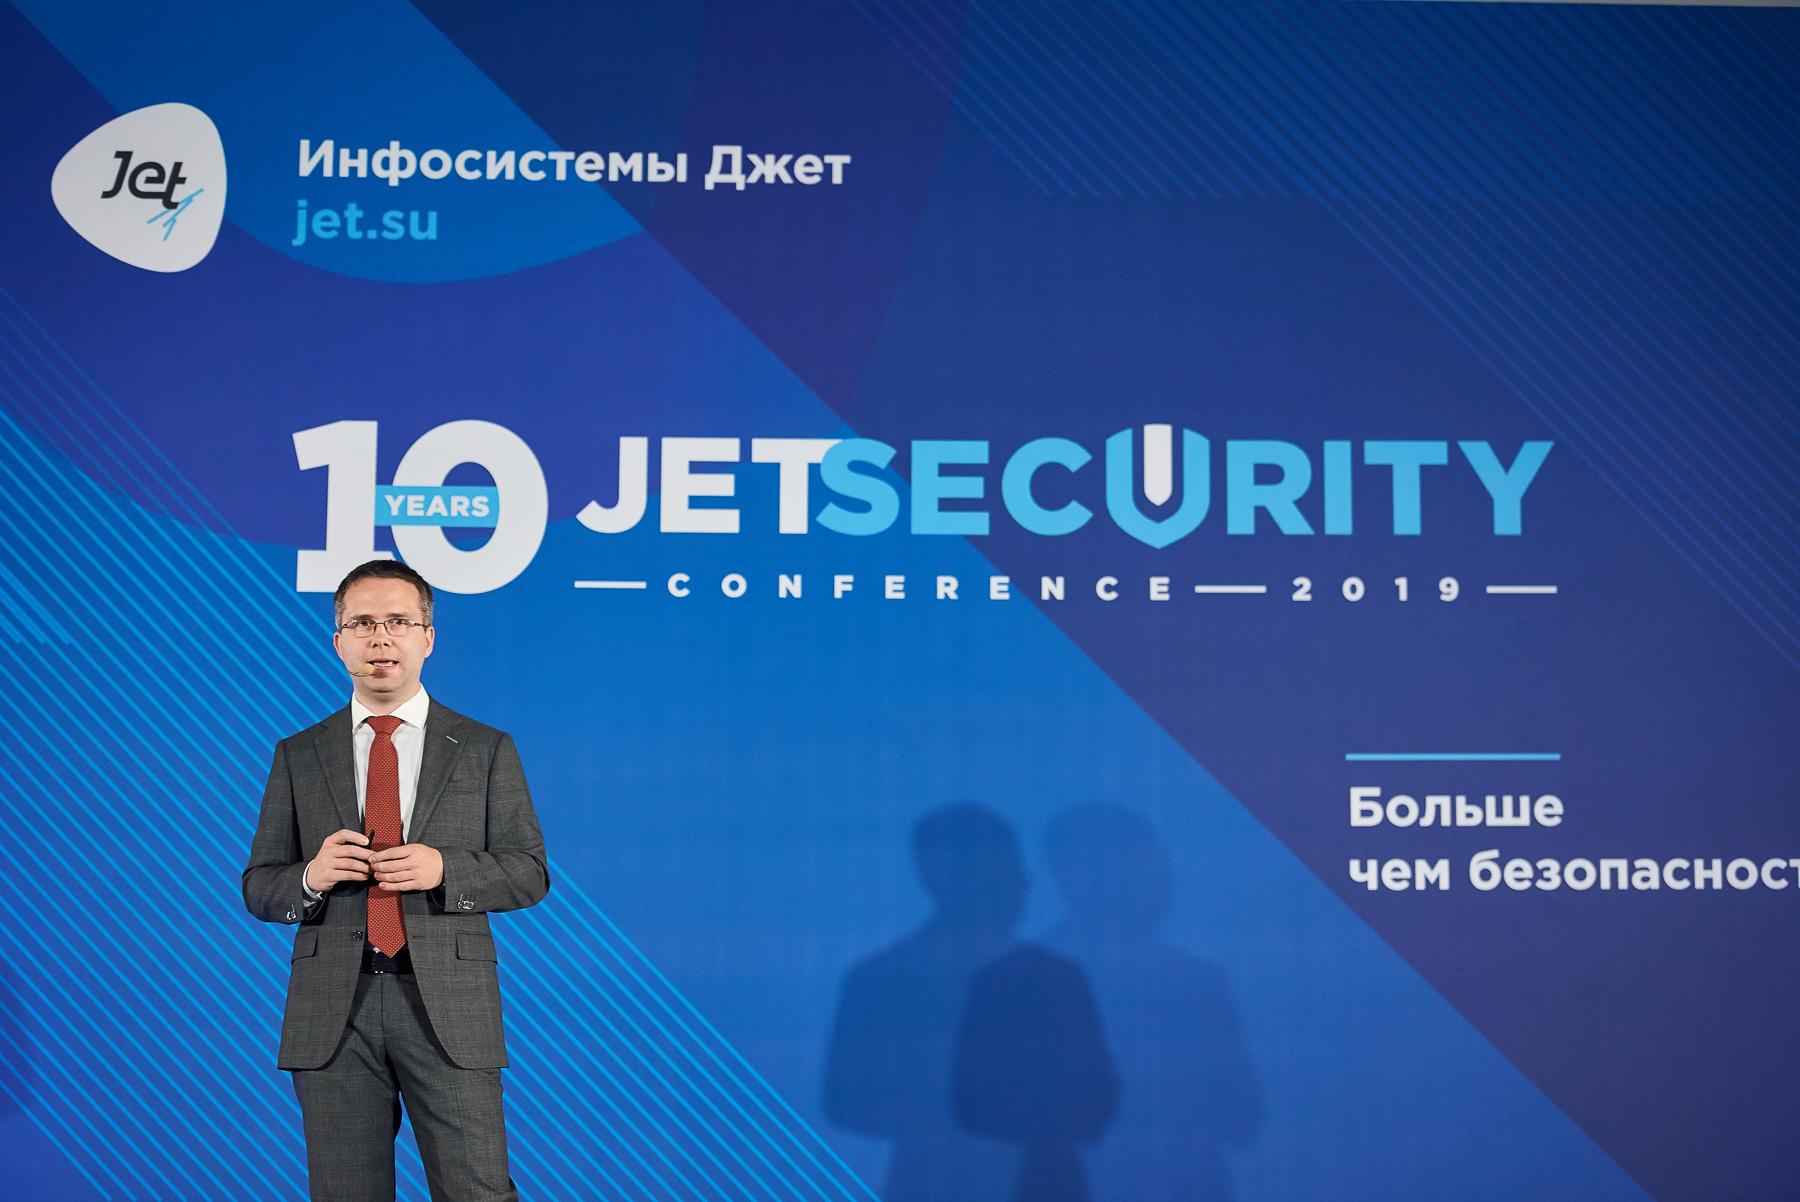 2019-06-06 Jet 225